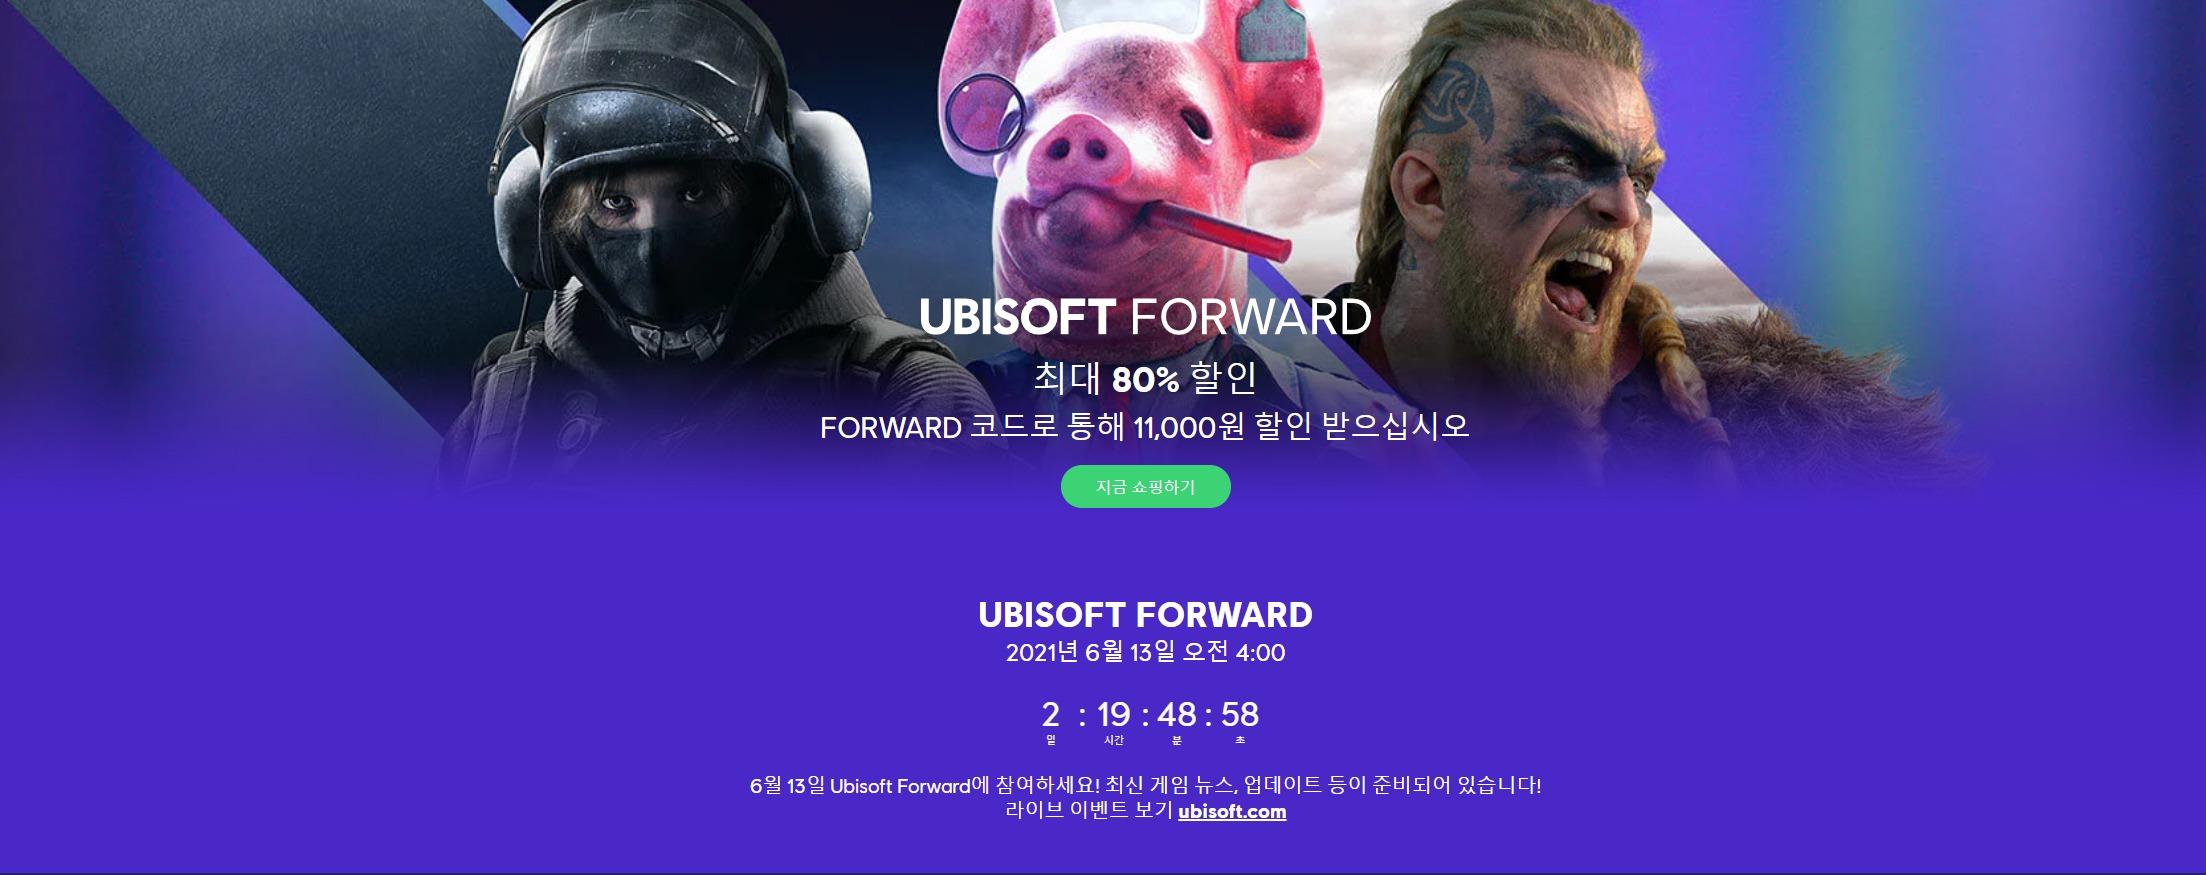 FireShot Capture 730 - Ubisoft Store - 공식 온라인 스토어 - store.ubi.com.jpg